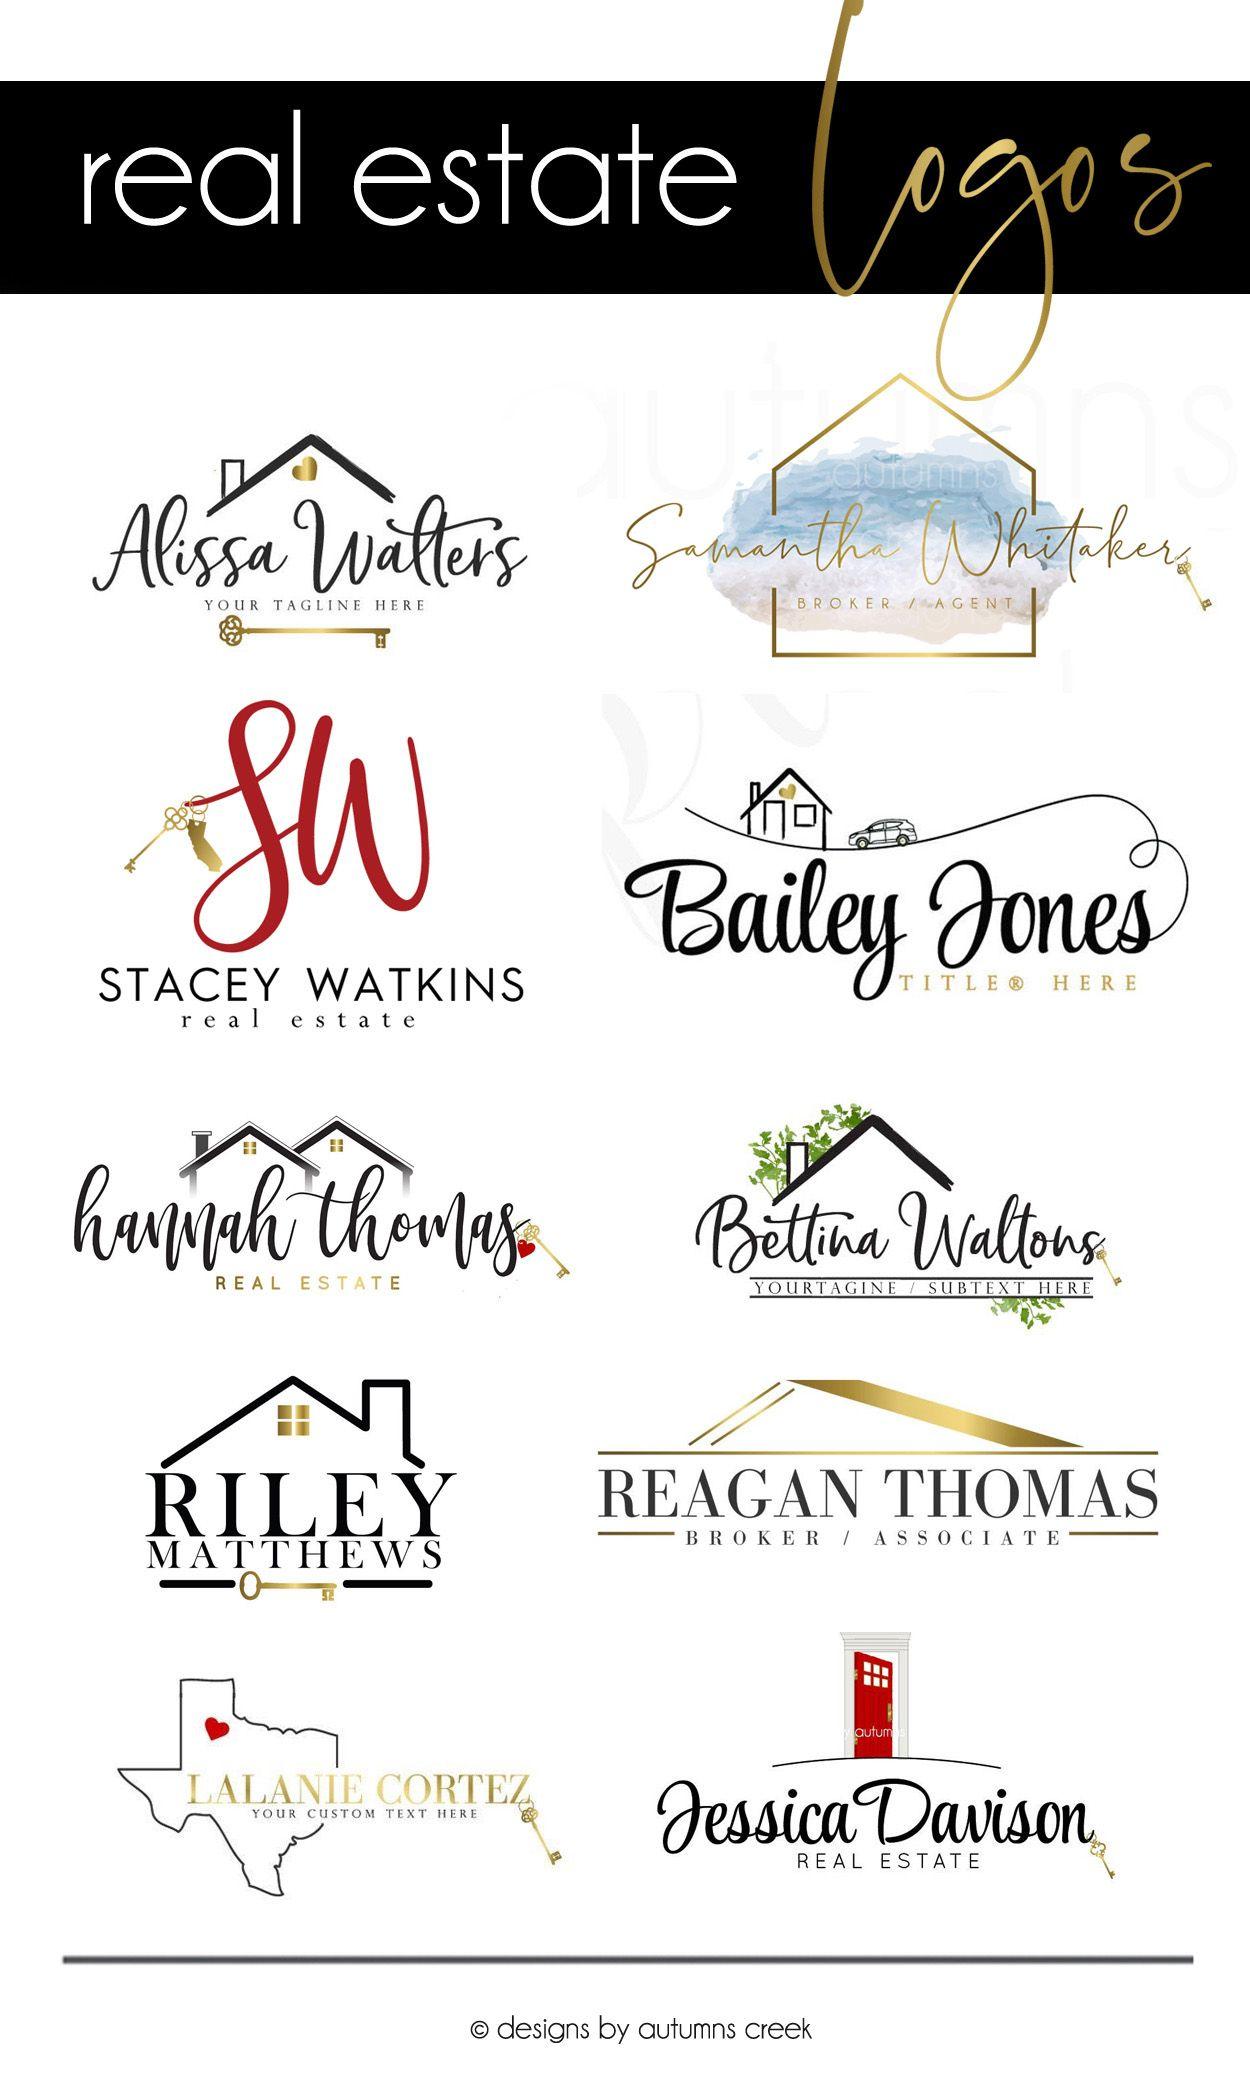 real estate marketing real estate logo designs realtor